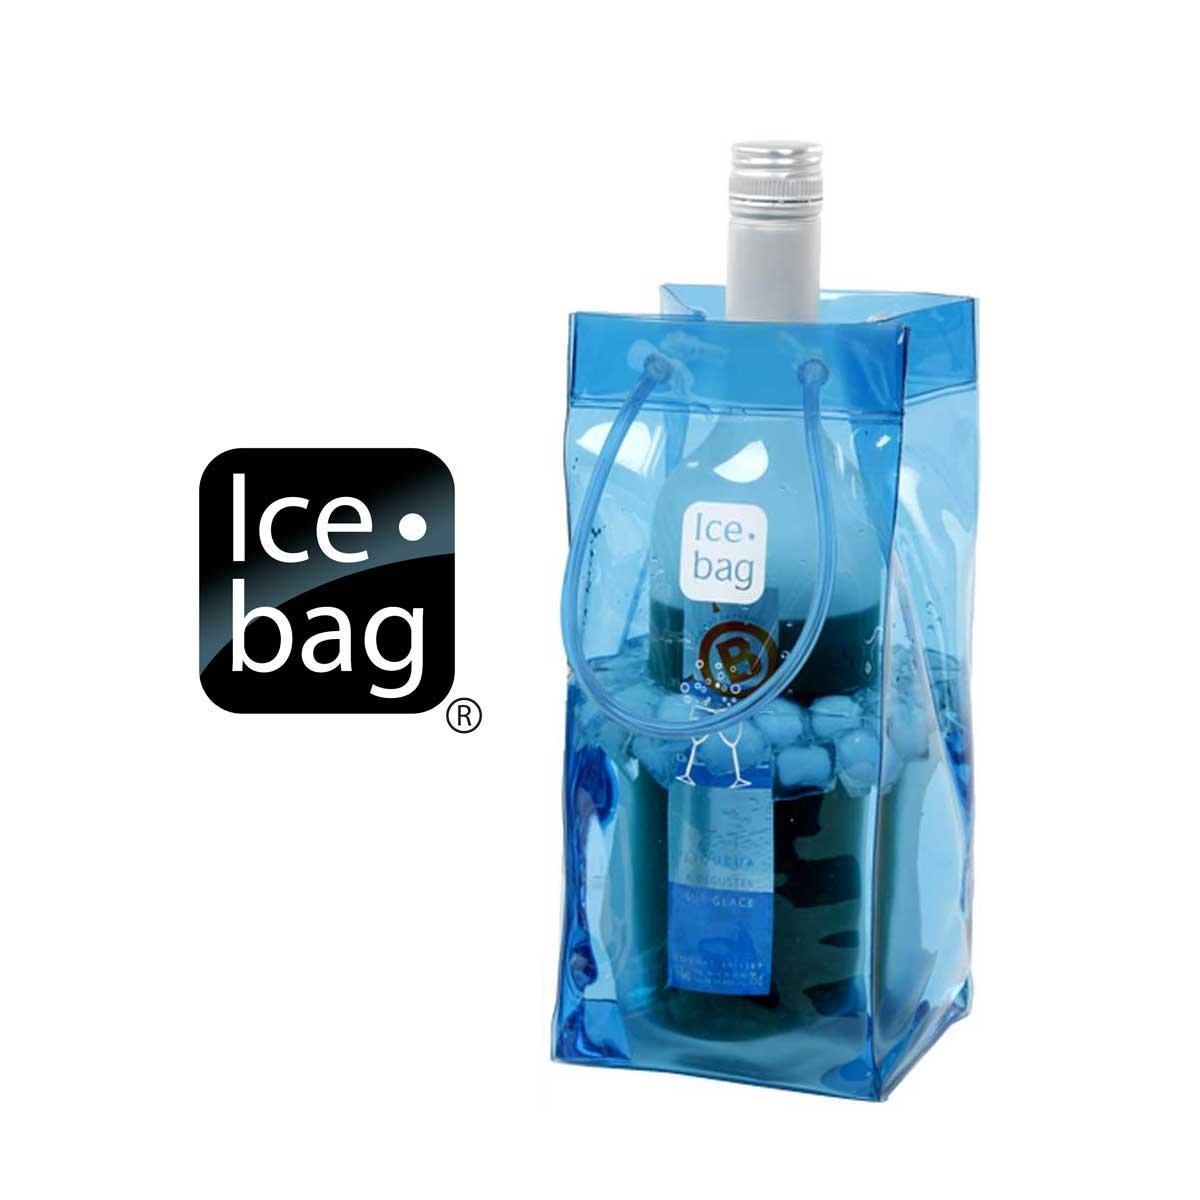 Portable Ice Bag - Blue, Set of 2